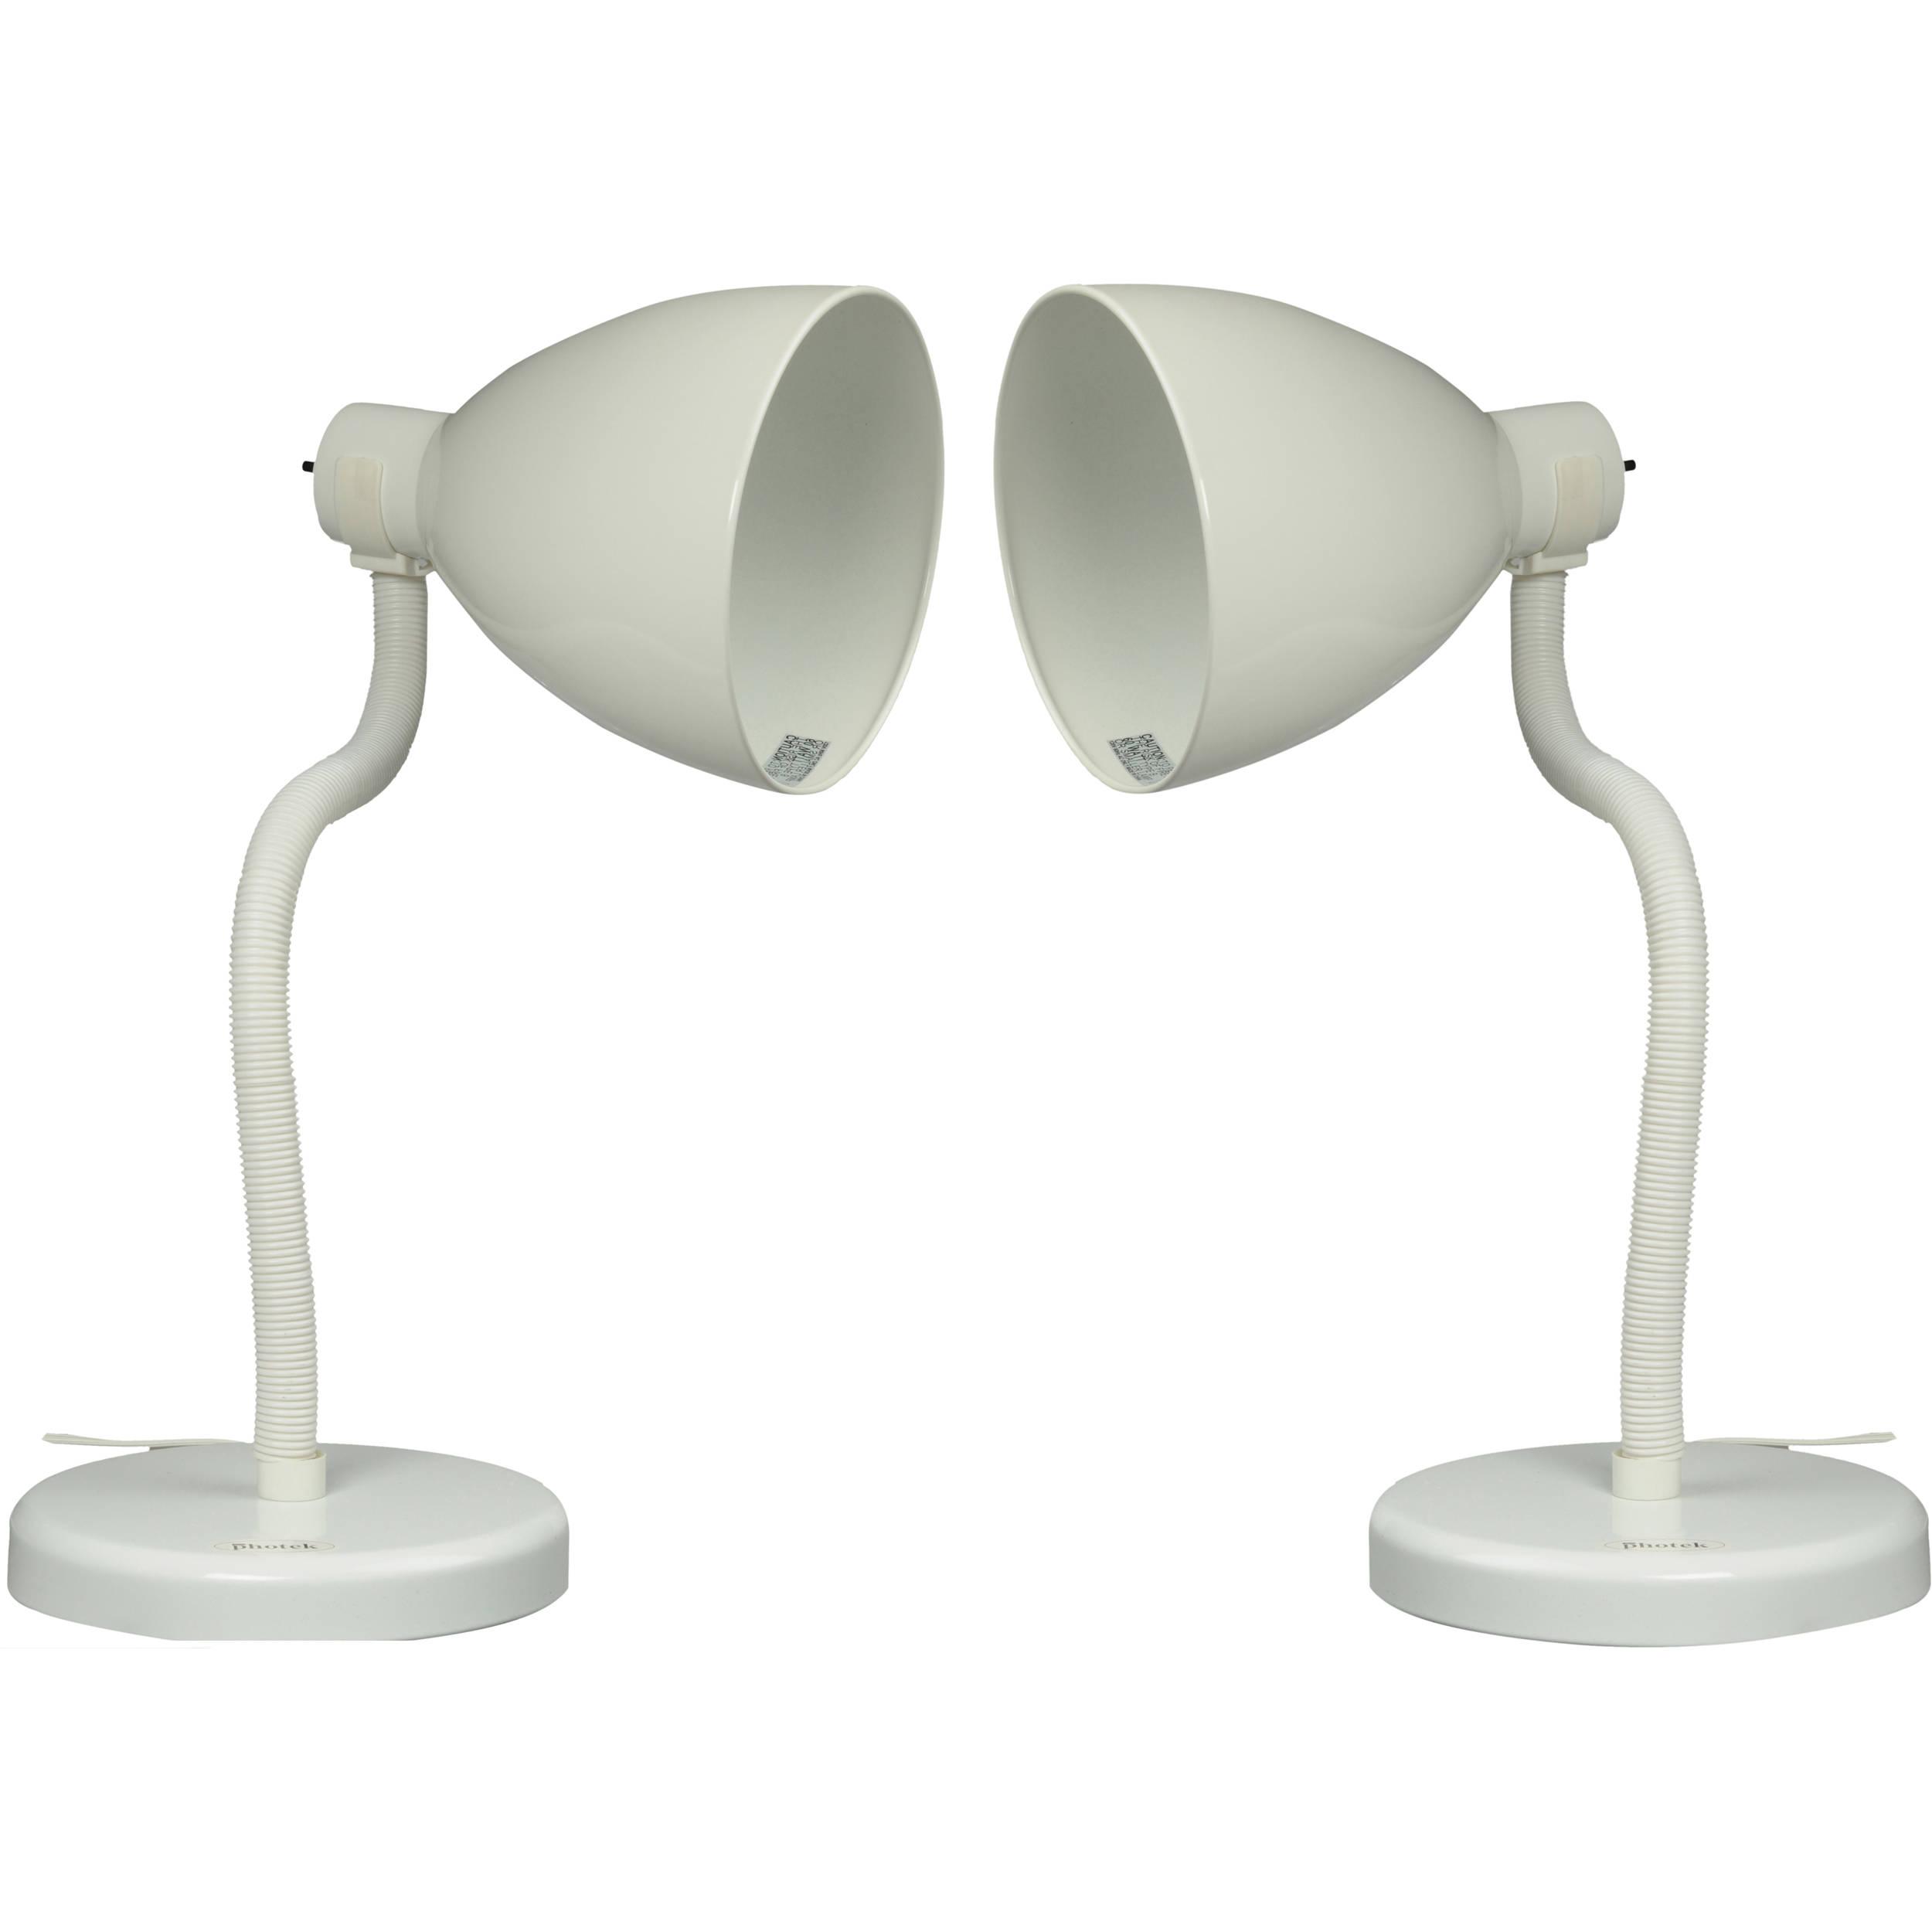 Photek LS 200 Table Top Lamp Set (2) With Bulbs